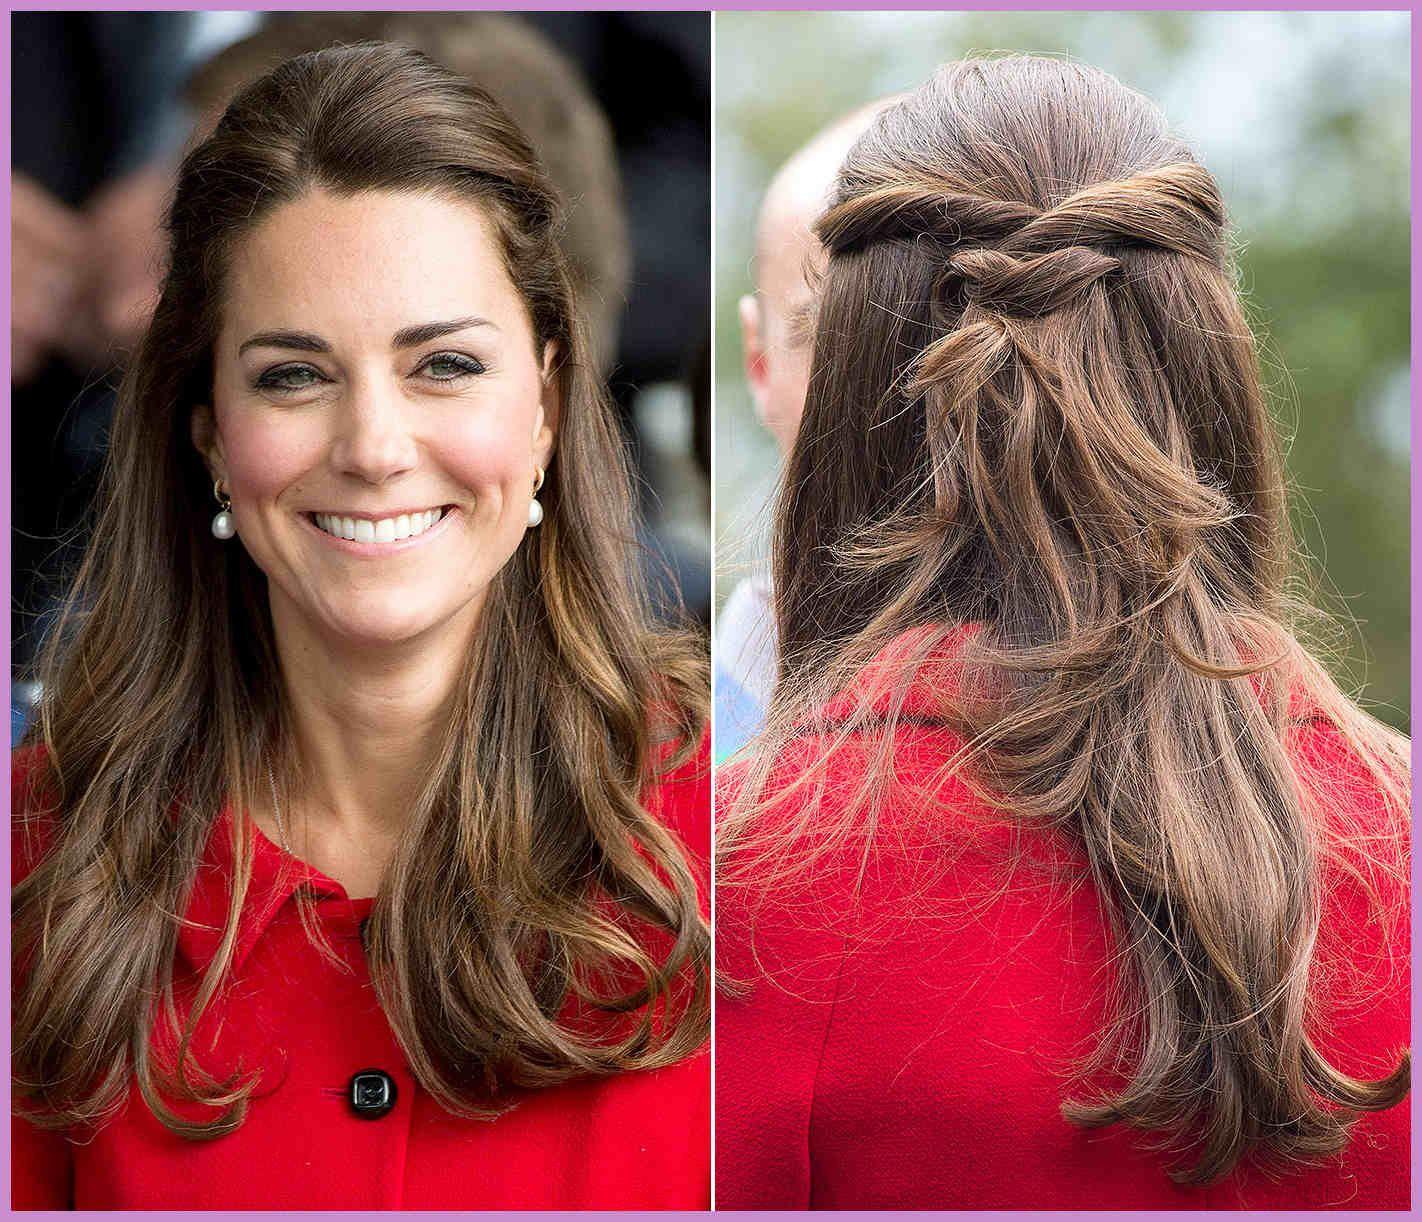 Frisur-Frisuren Kate Middleton Haar Tutorial - Frisur-Frisuren